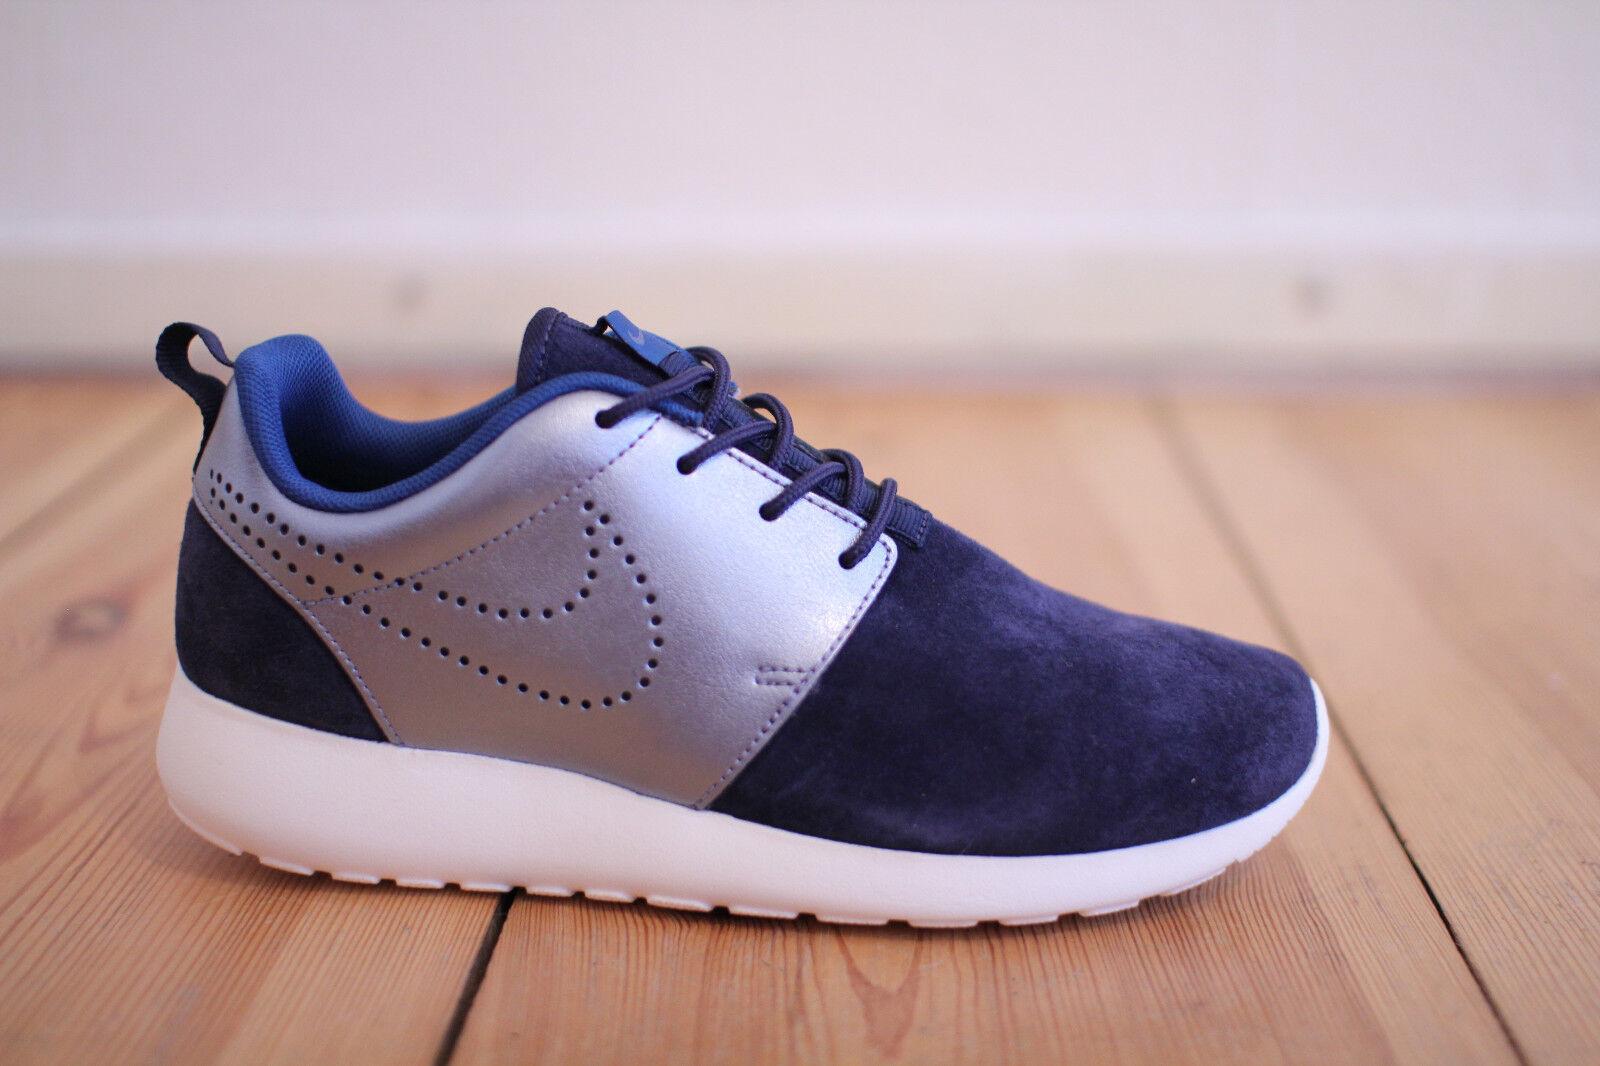 Nike Roshe One PRM Suede WMNS NEU Gr. 38 UK 4,5 NEU WMNS & OVP 476334